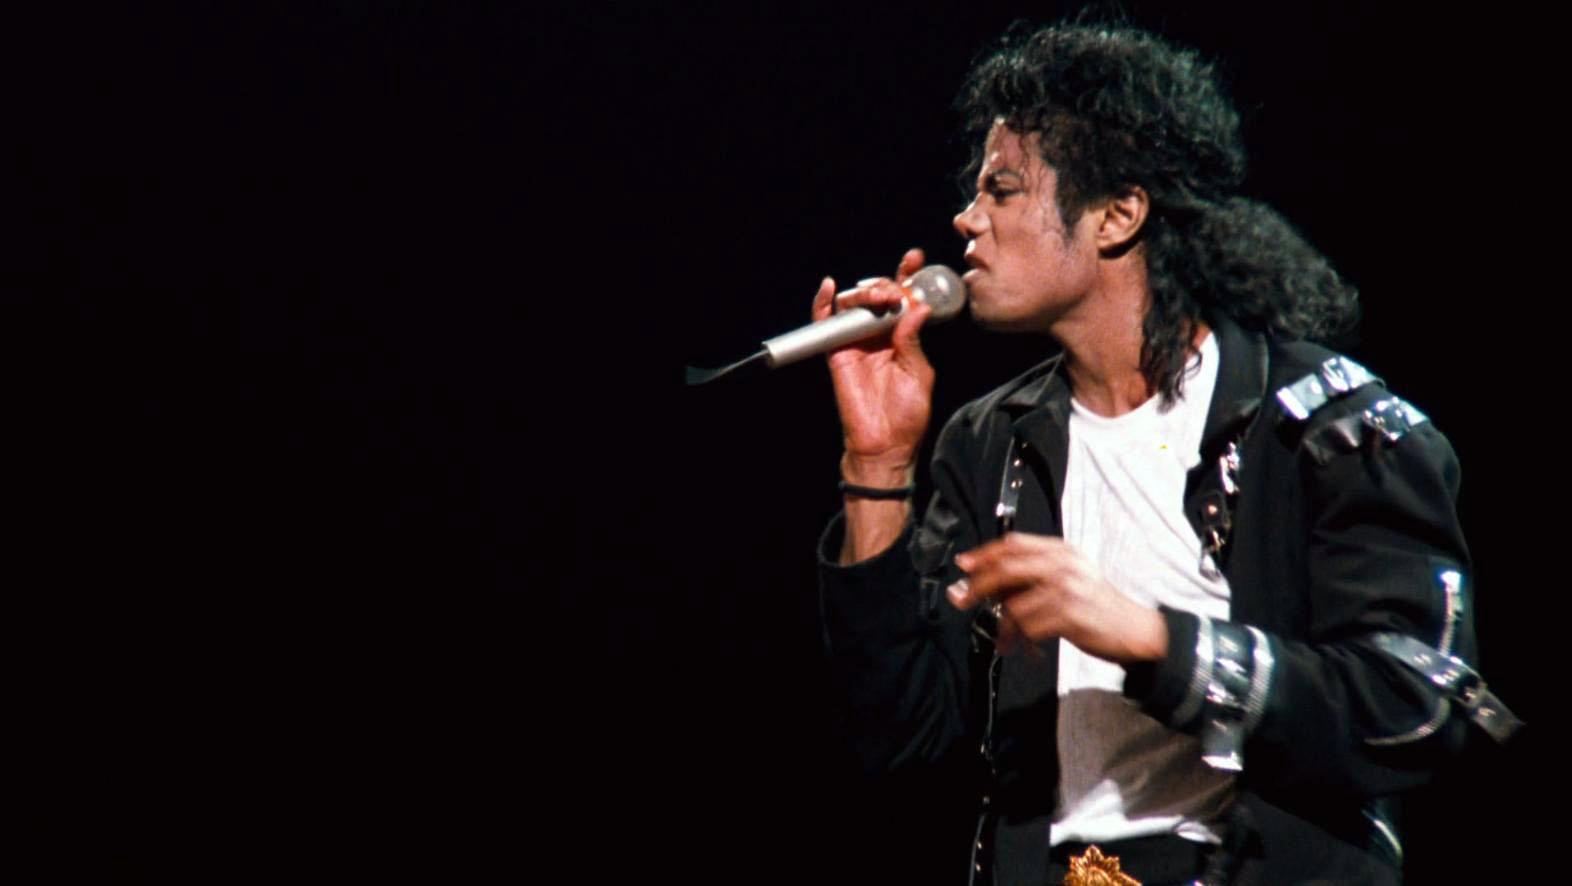 Michael Jackson man in The Mirror instrumental Mp3 Download